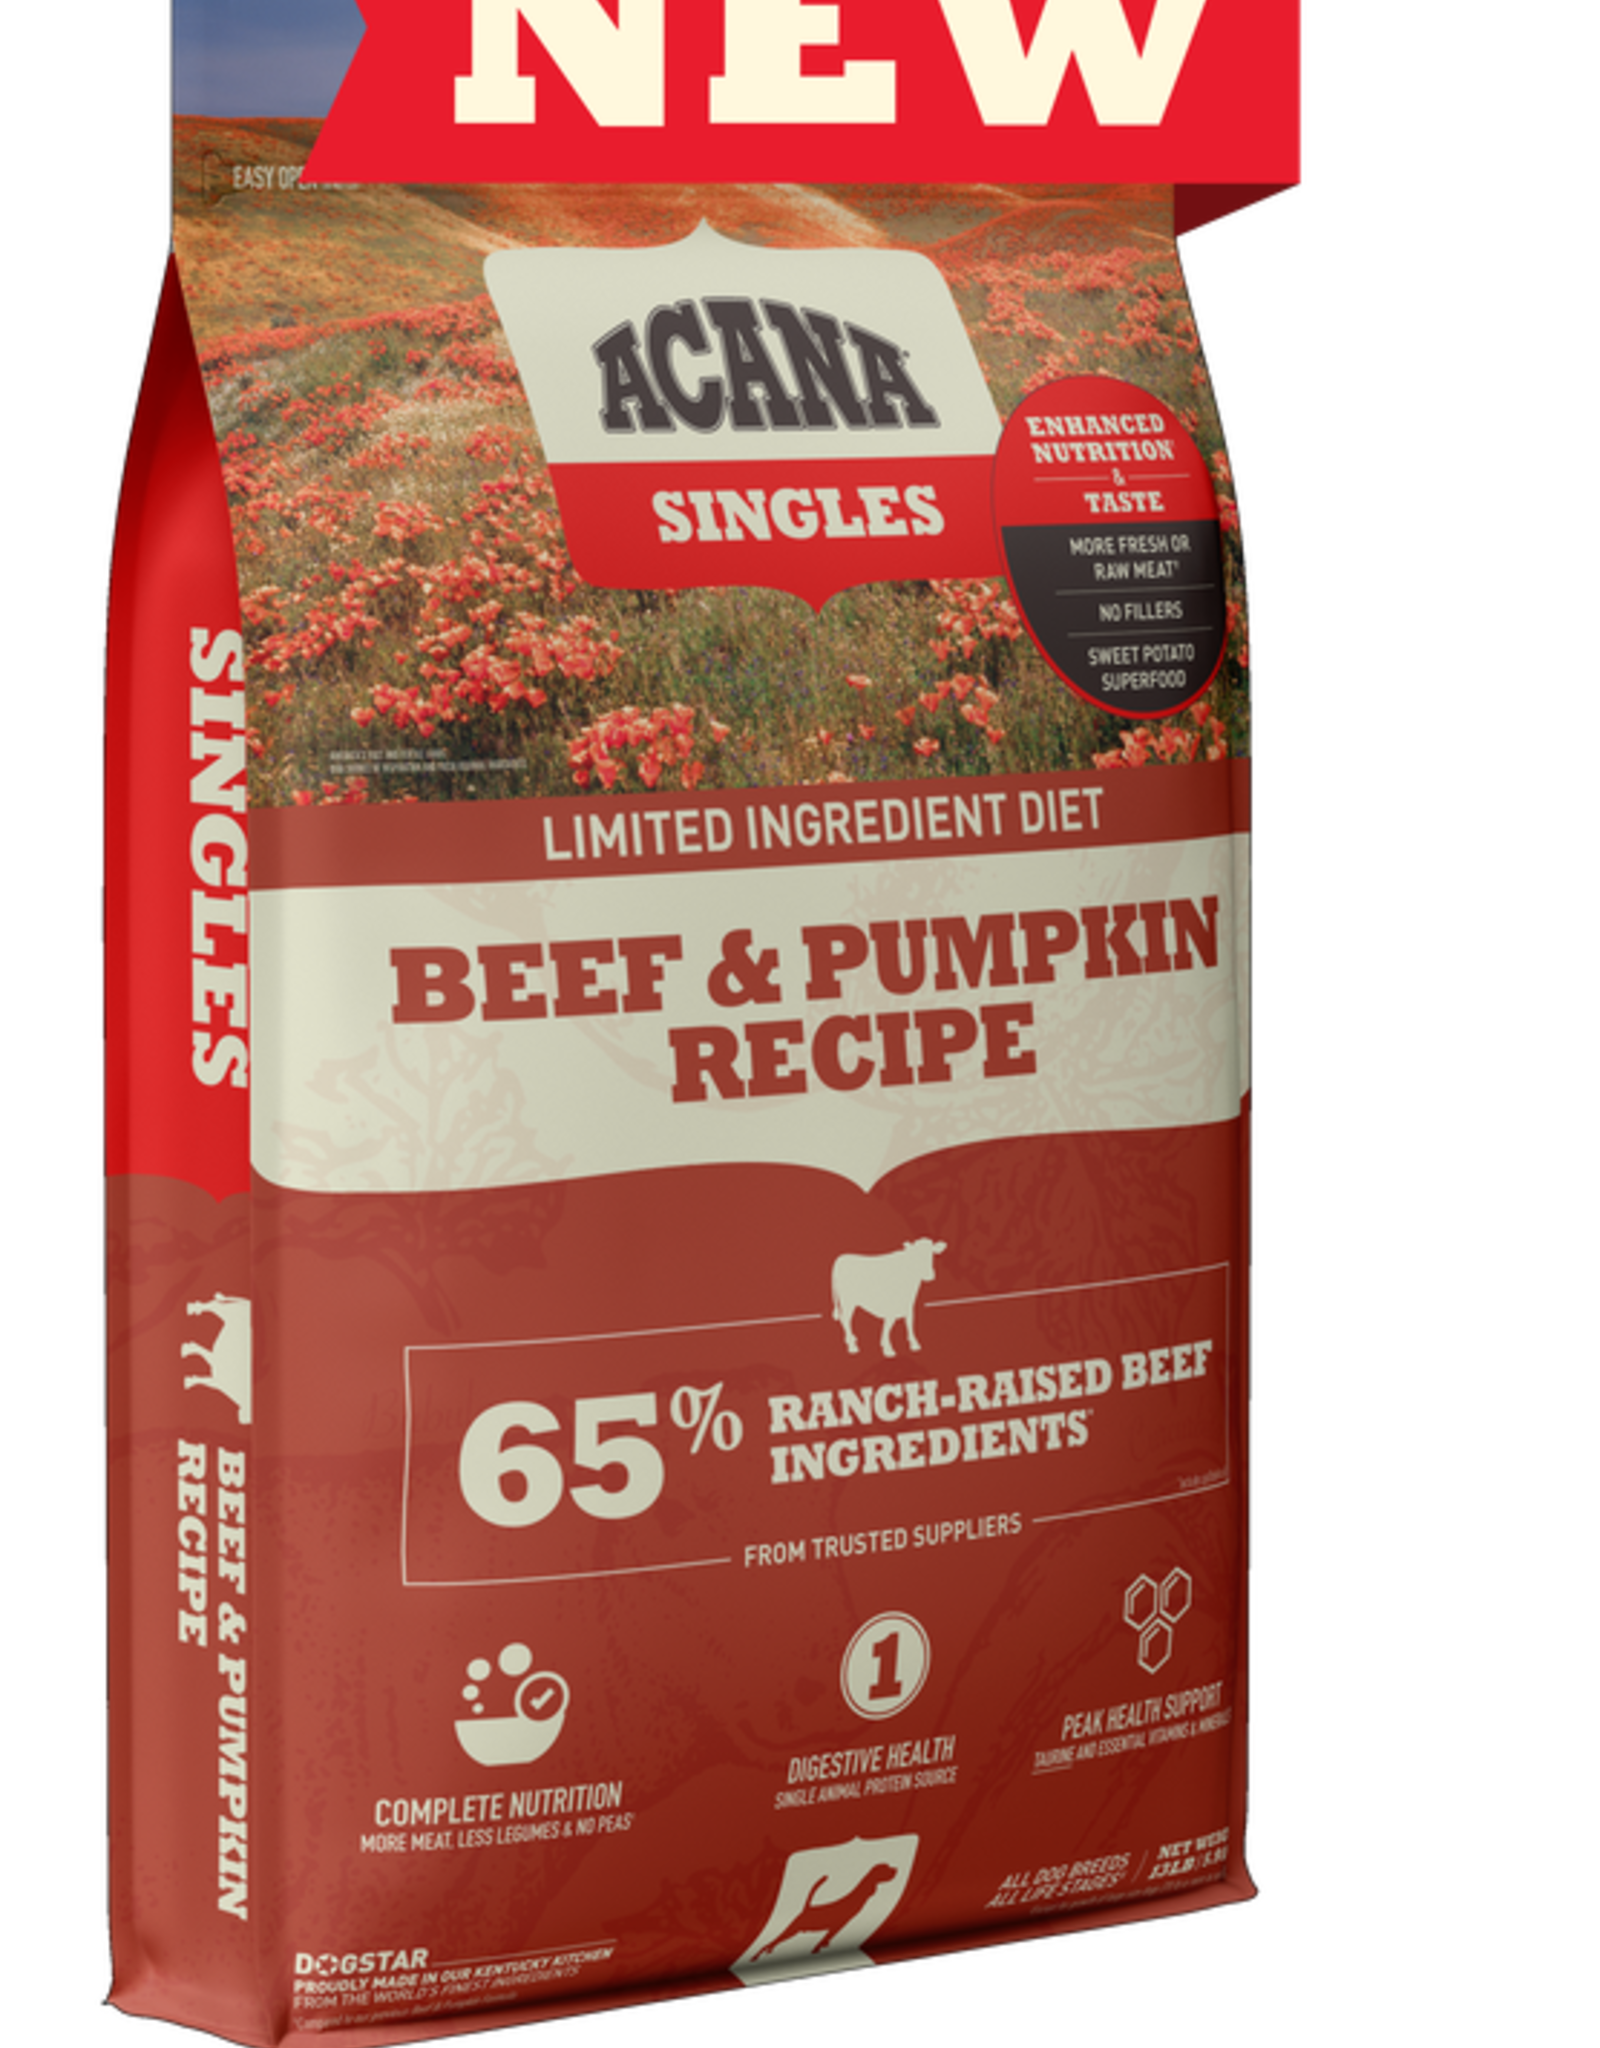 Acana Dog Singles Beef & Pumpkin - Grain-Free 13lb